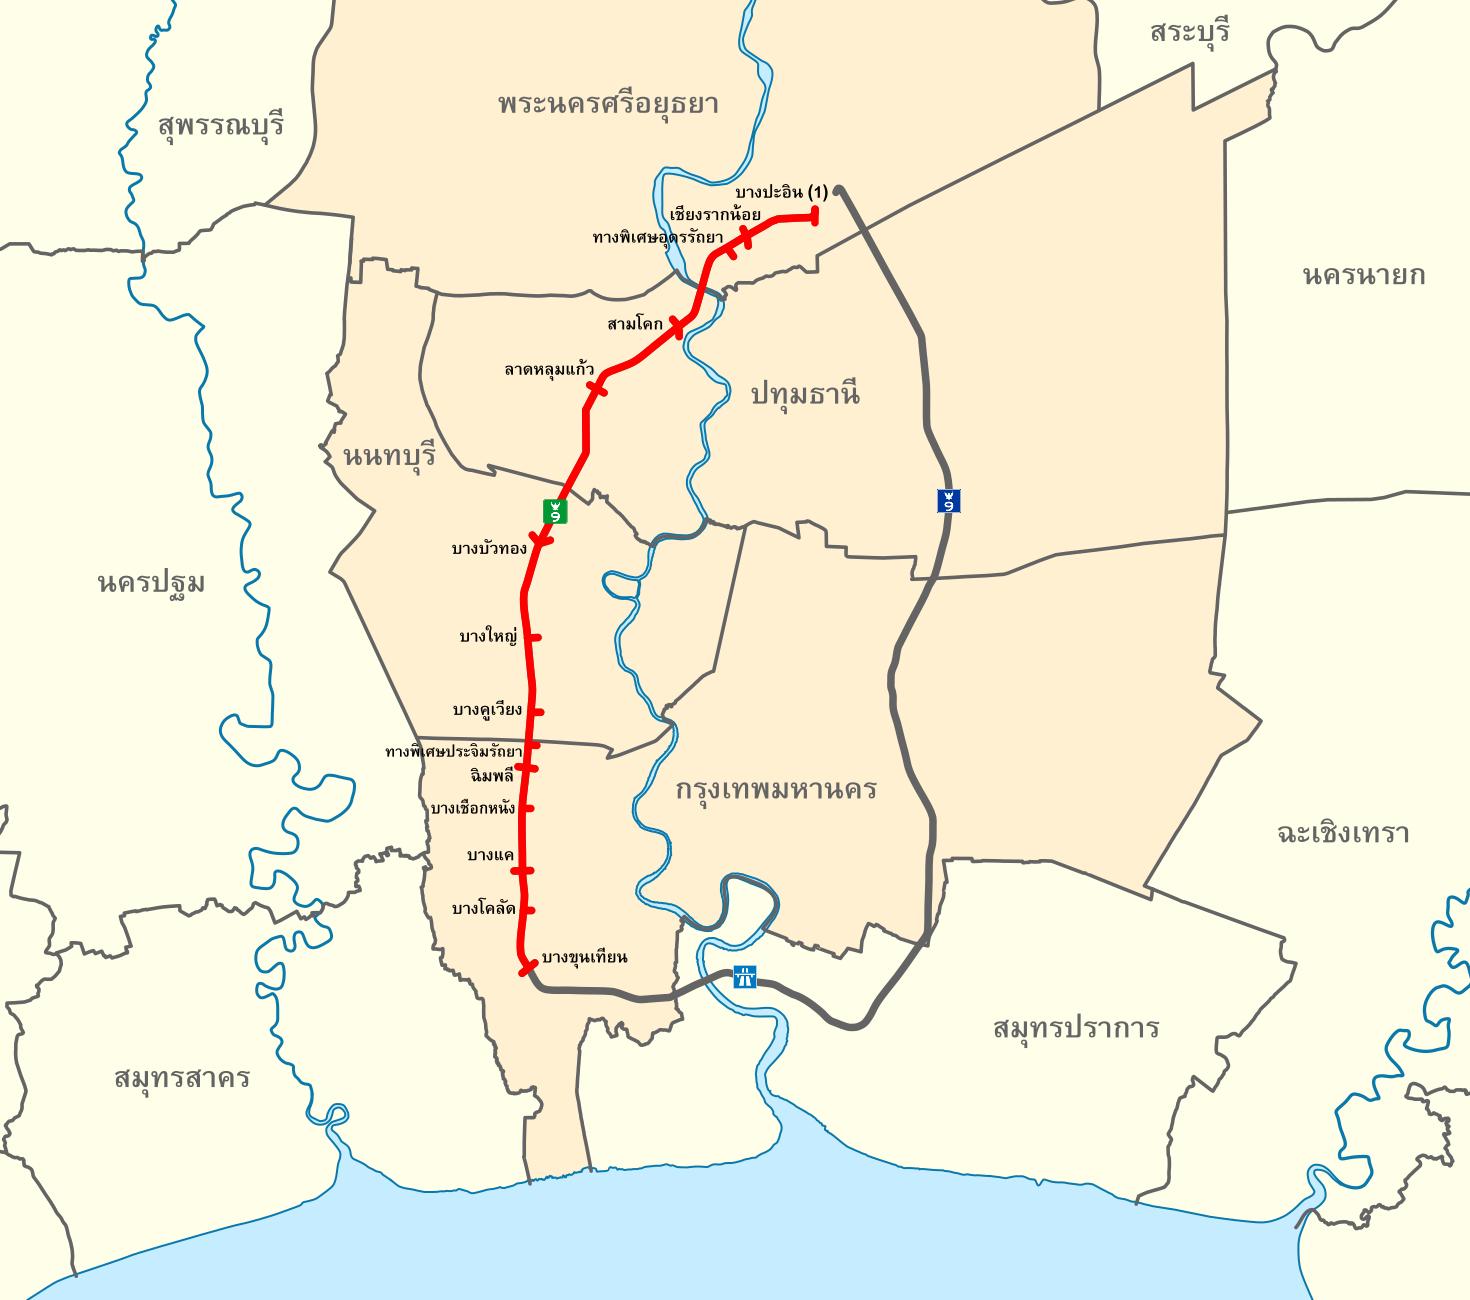 Western Ring Road Broadmeadows Eastbound